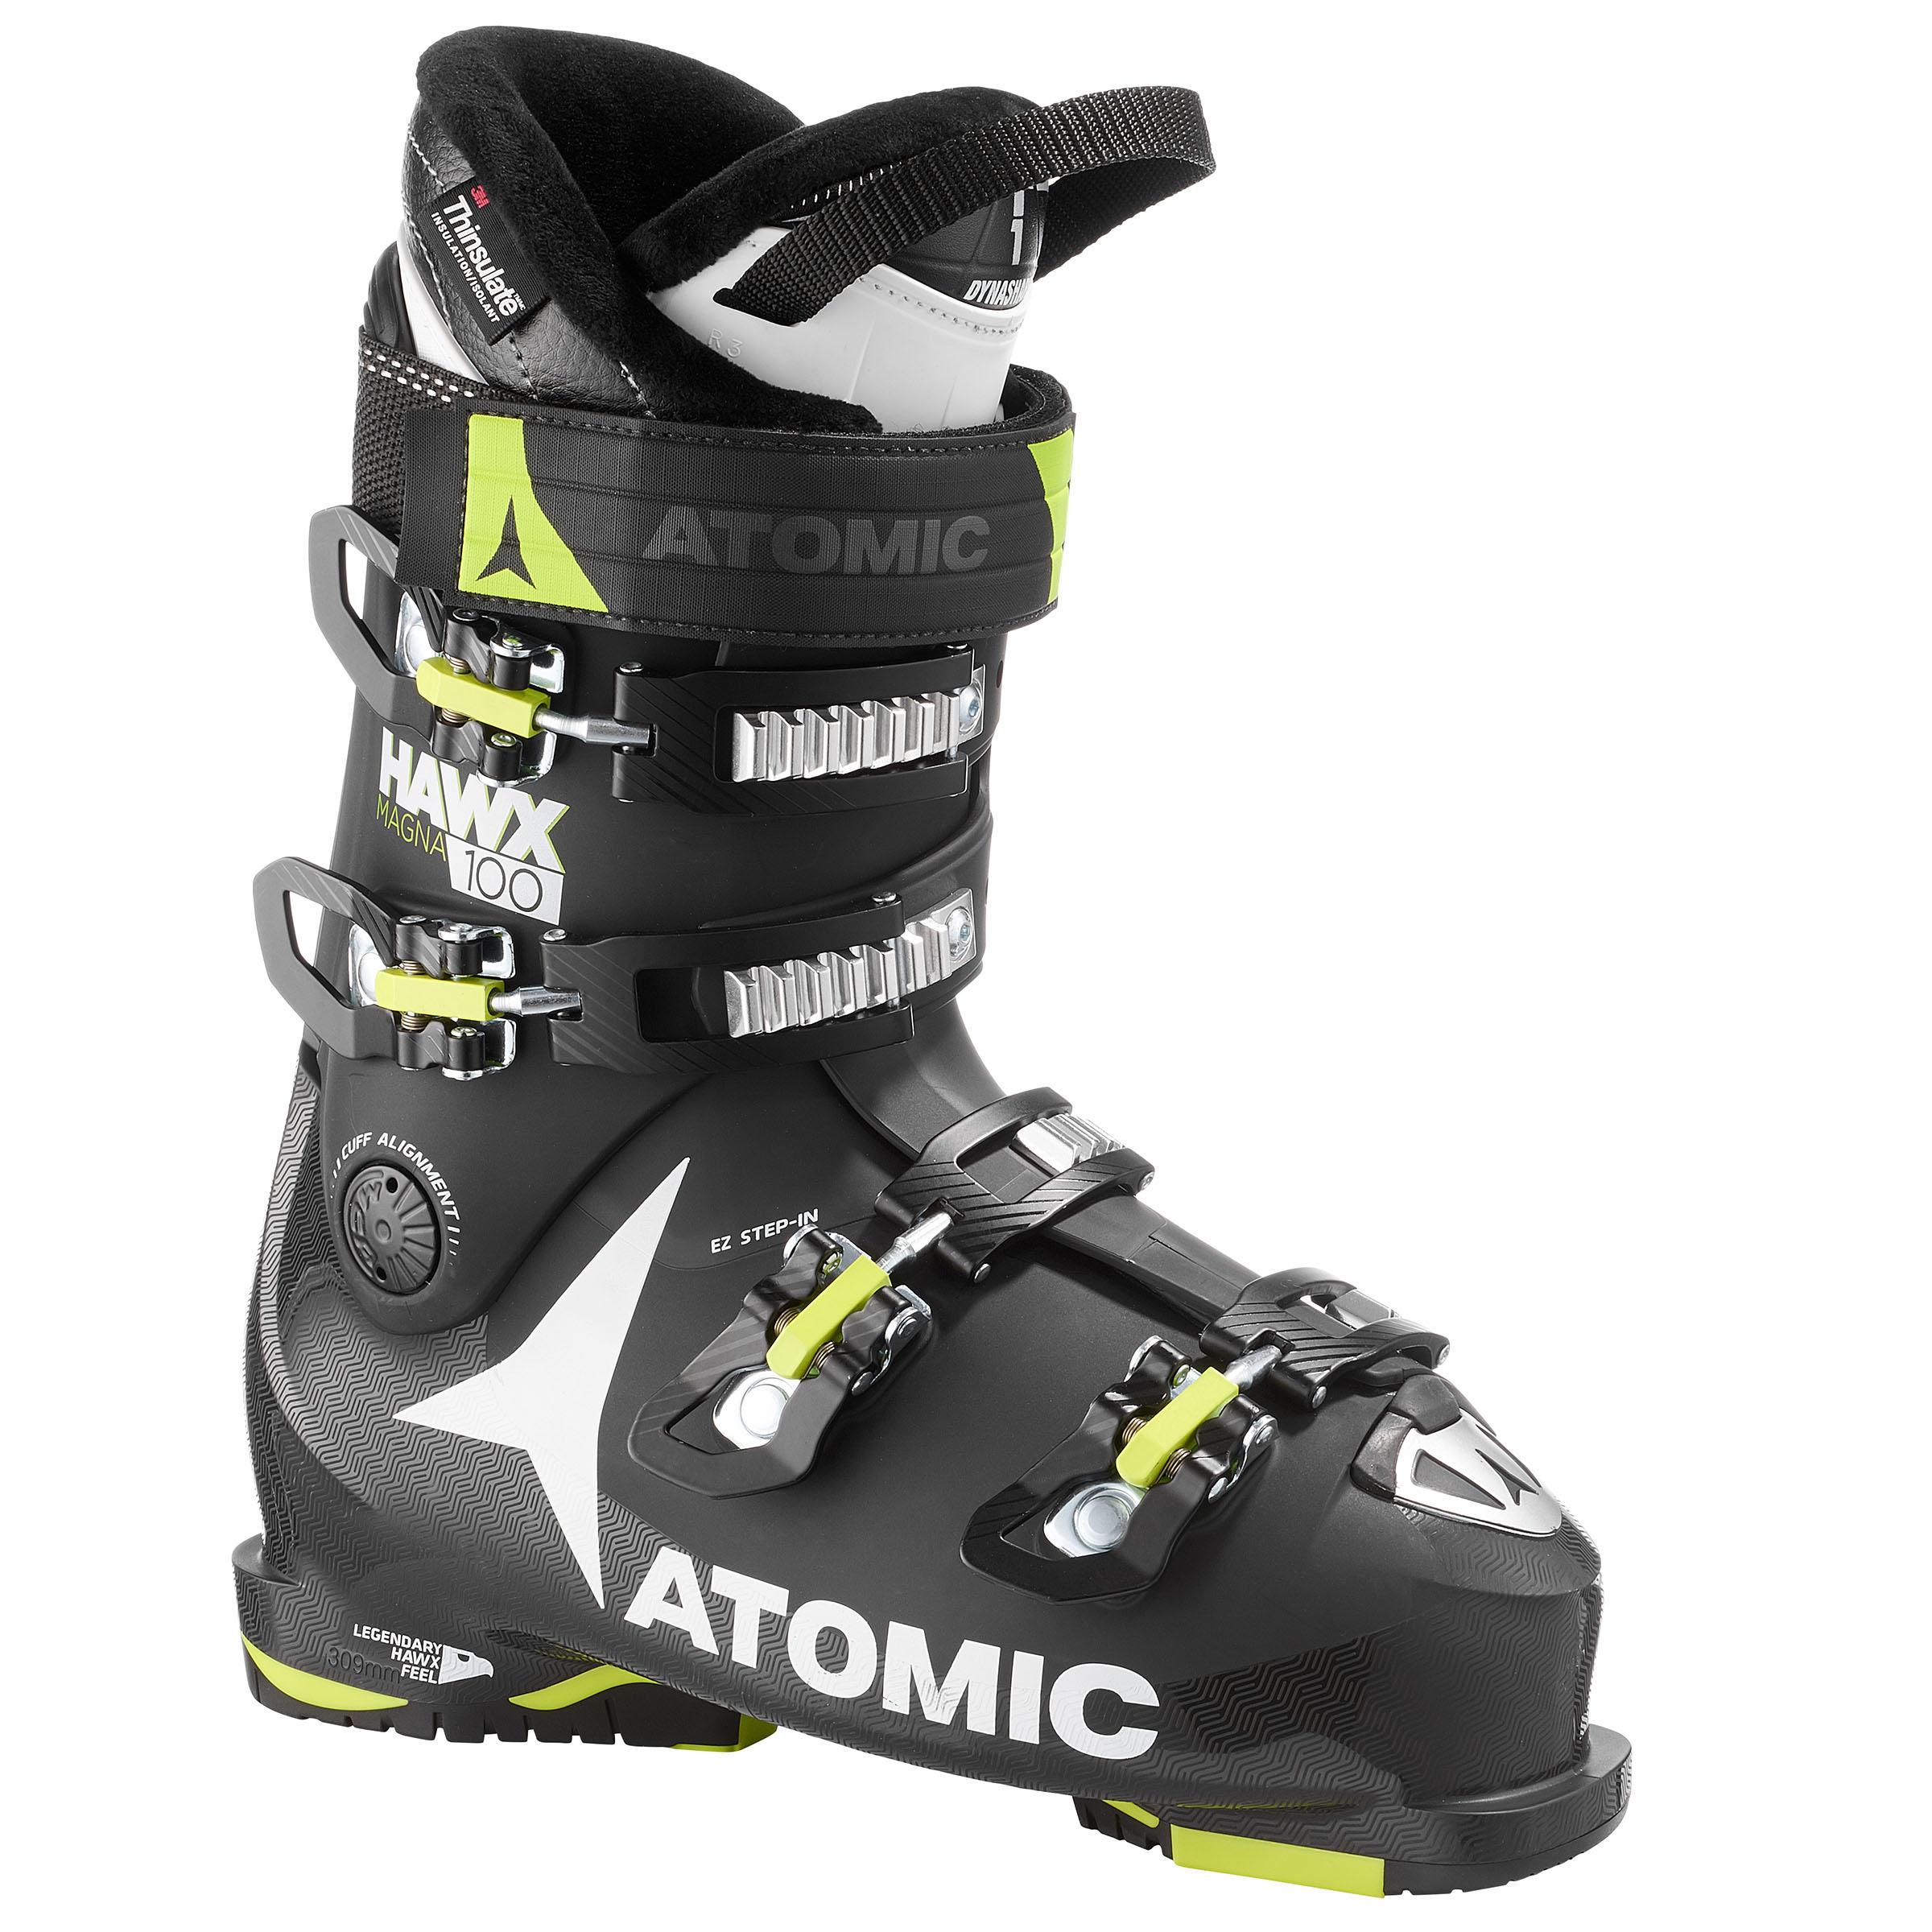 Atomic Skischoenen Hawx Magna 100 zwart thumbnail